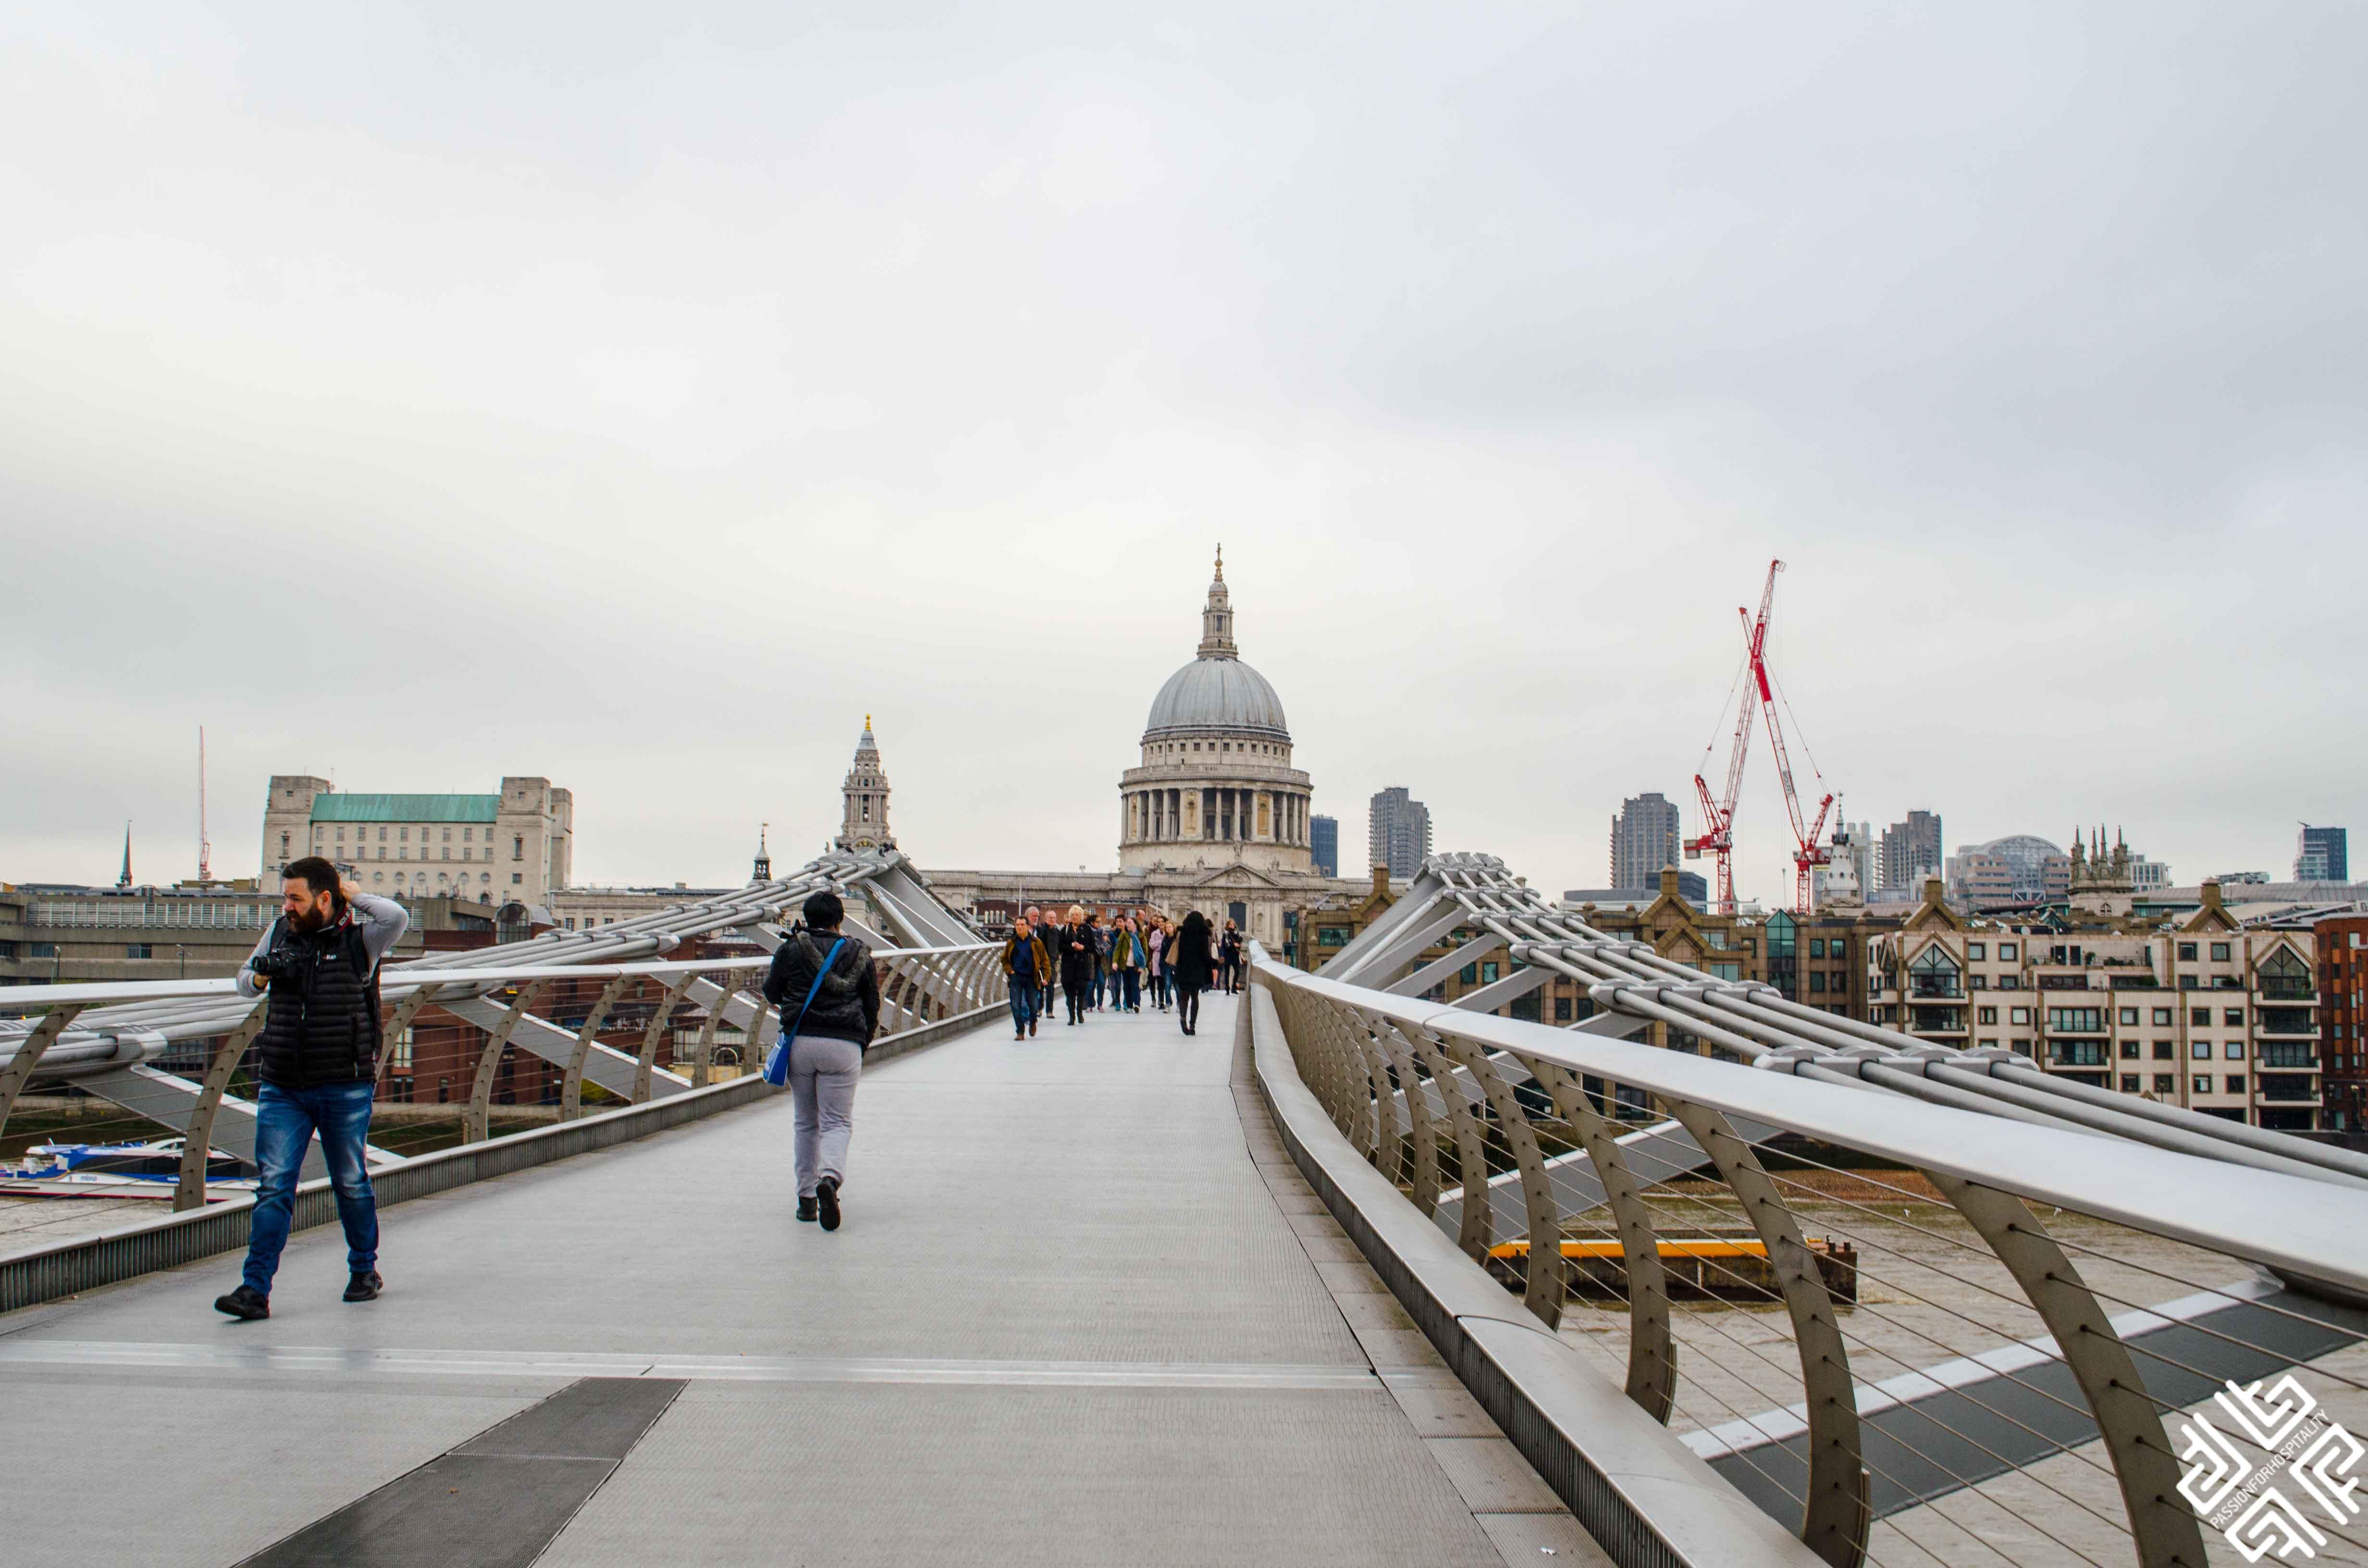 blue-badge-guide-city-of-london-tour-1